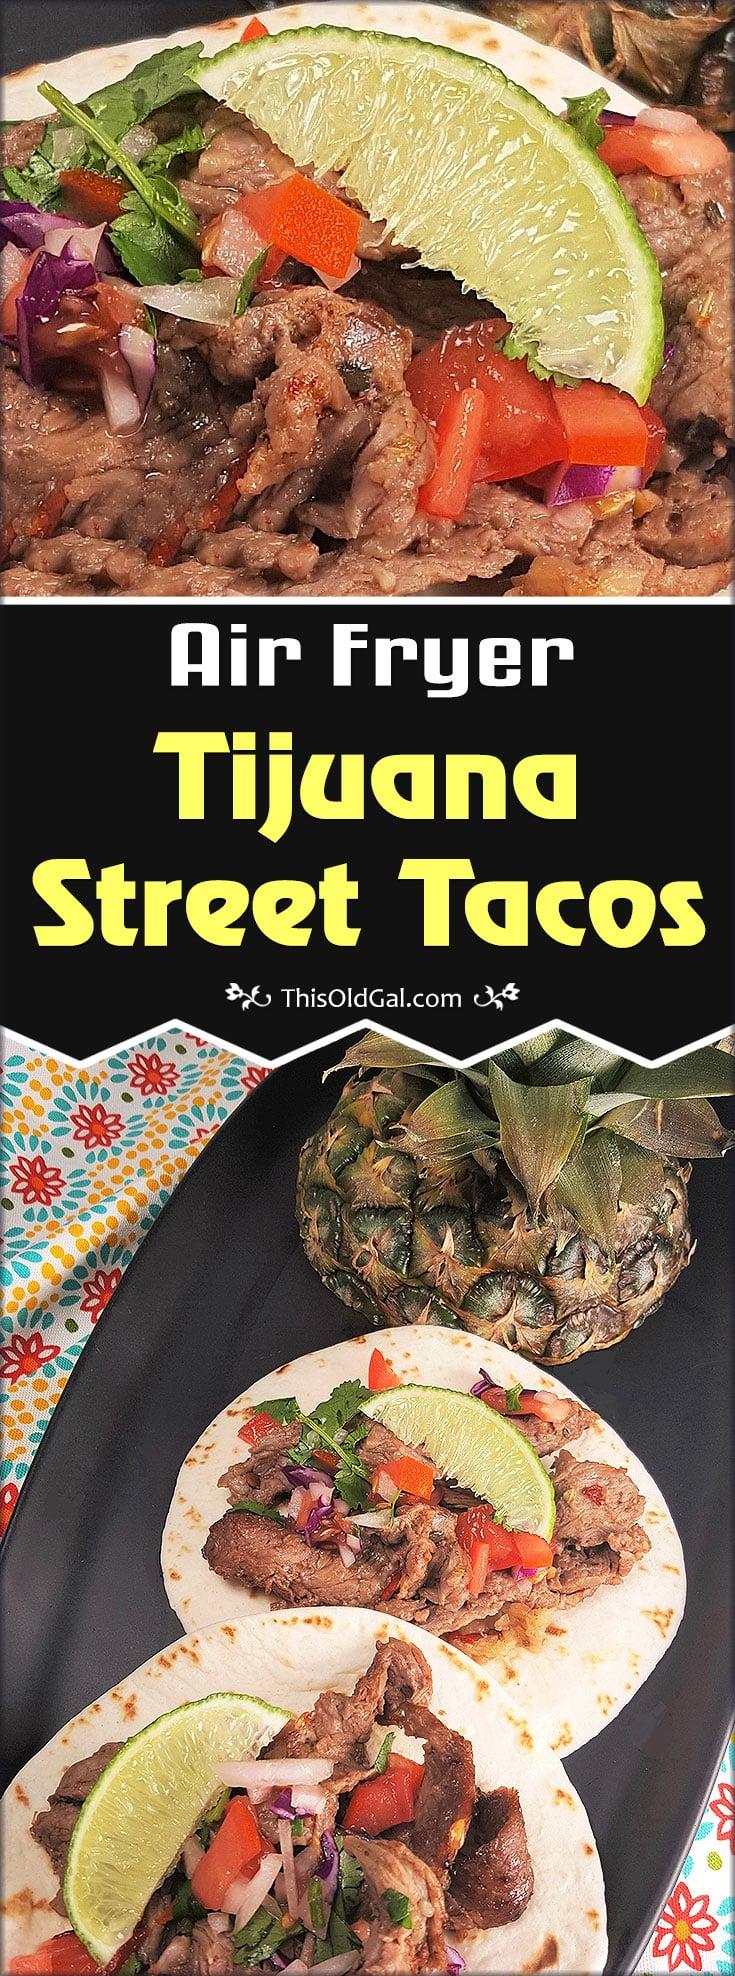 Air Fryer Tijuana, Mexico Street Carne Tacos